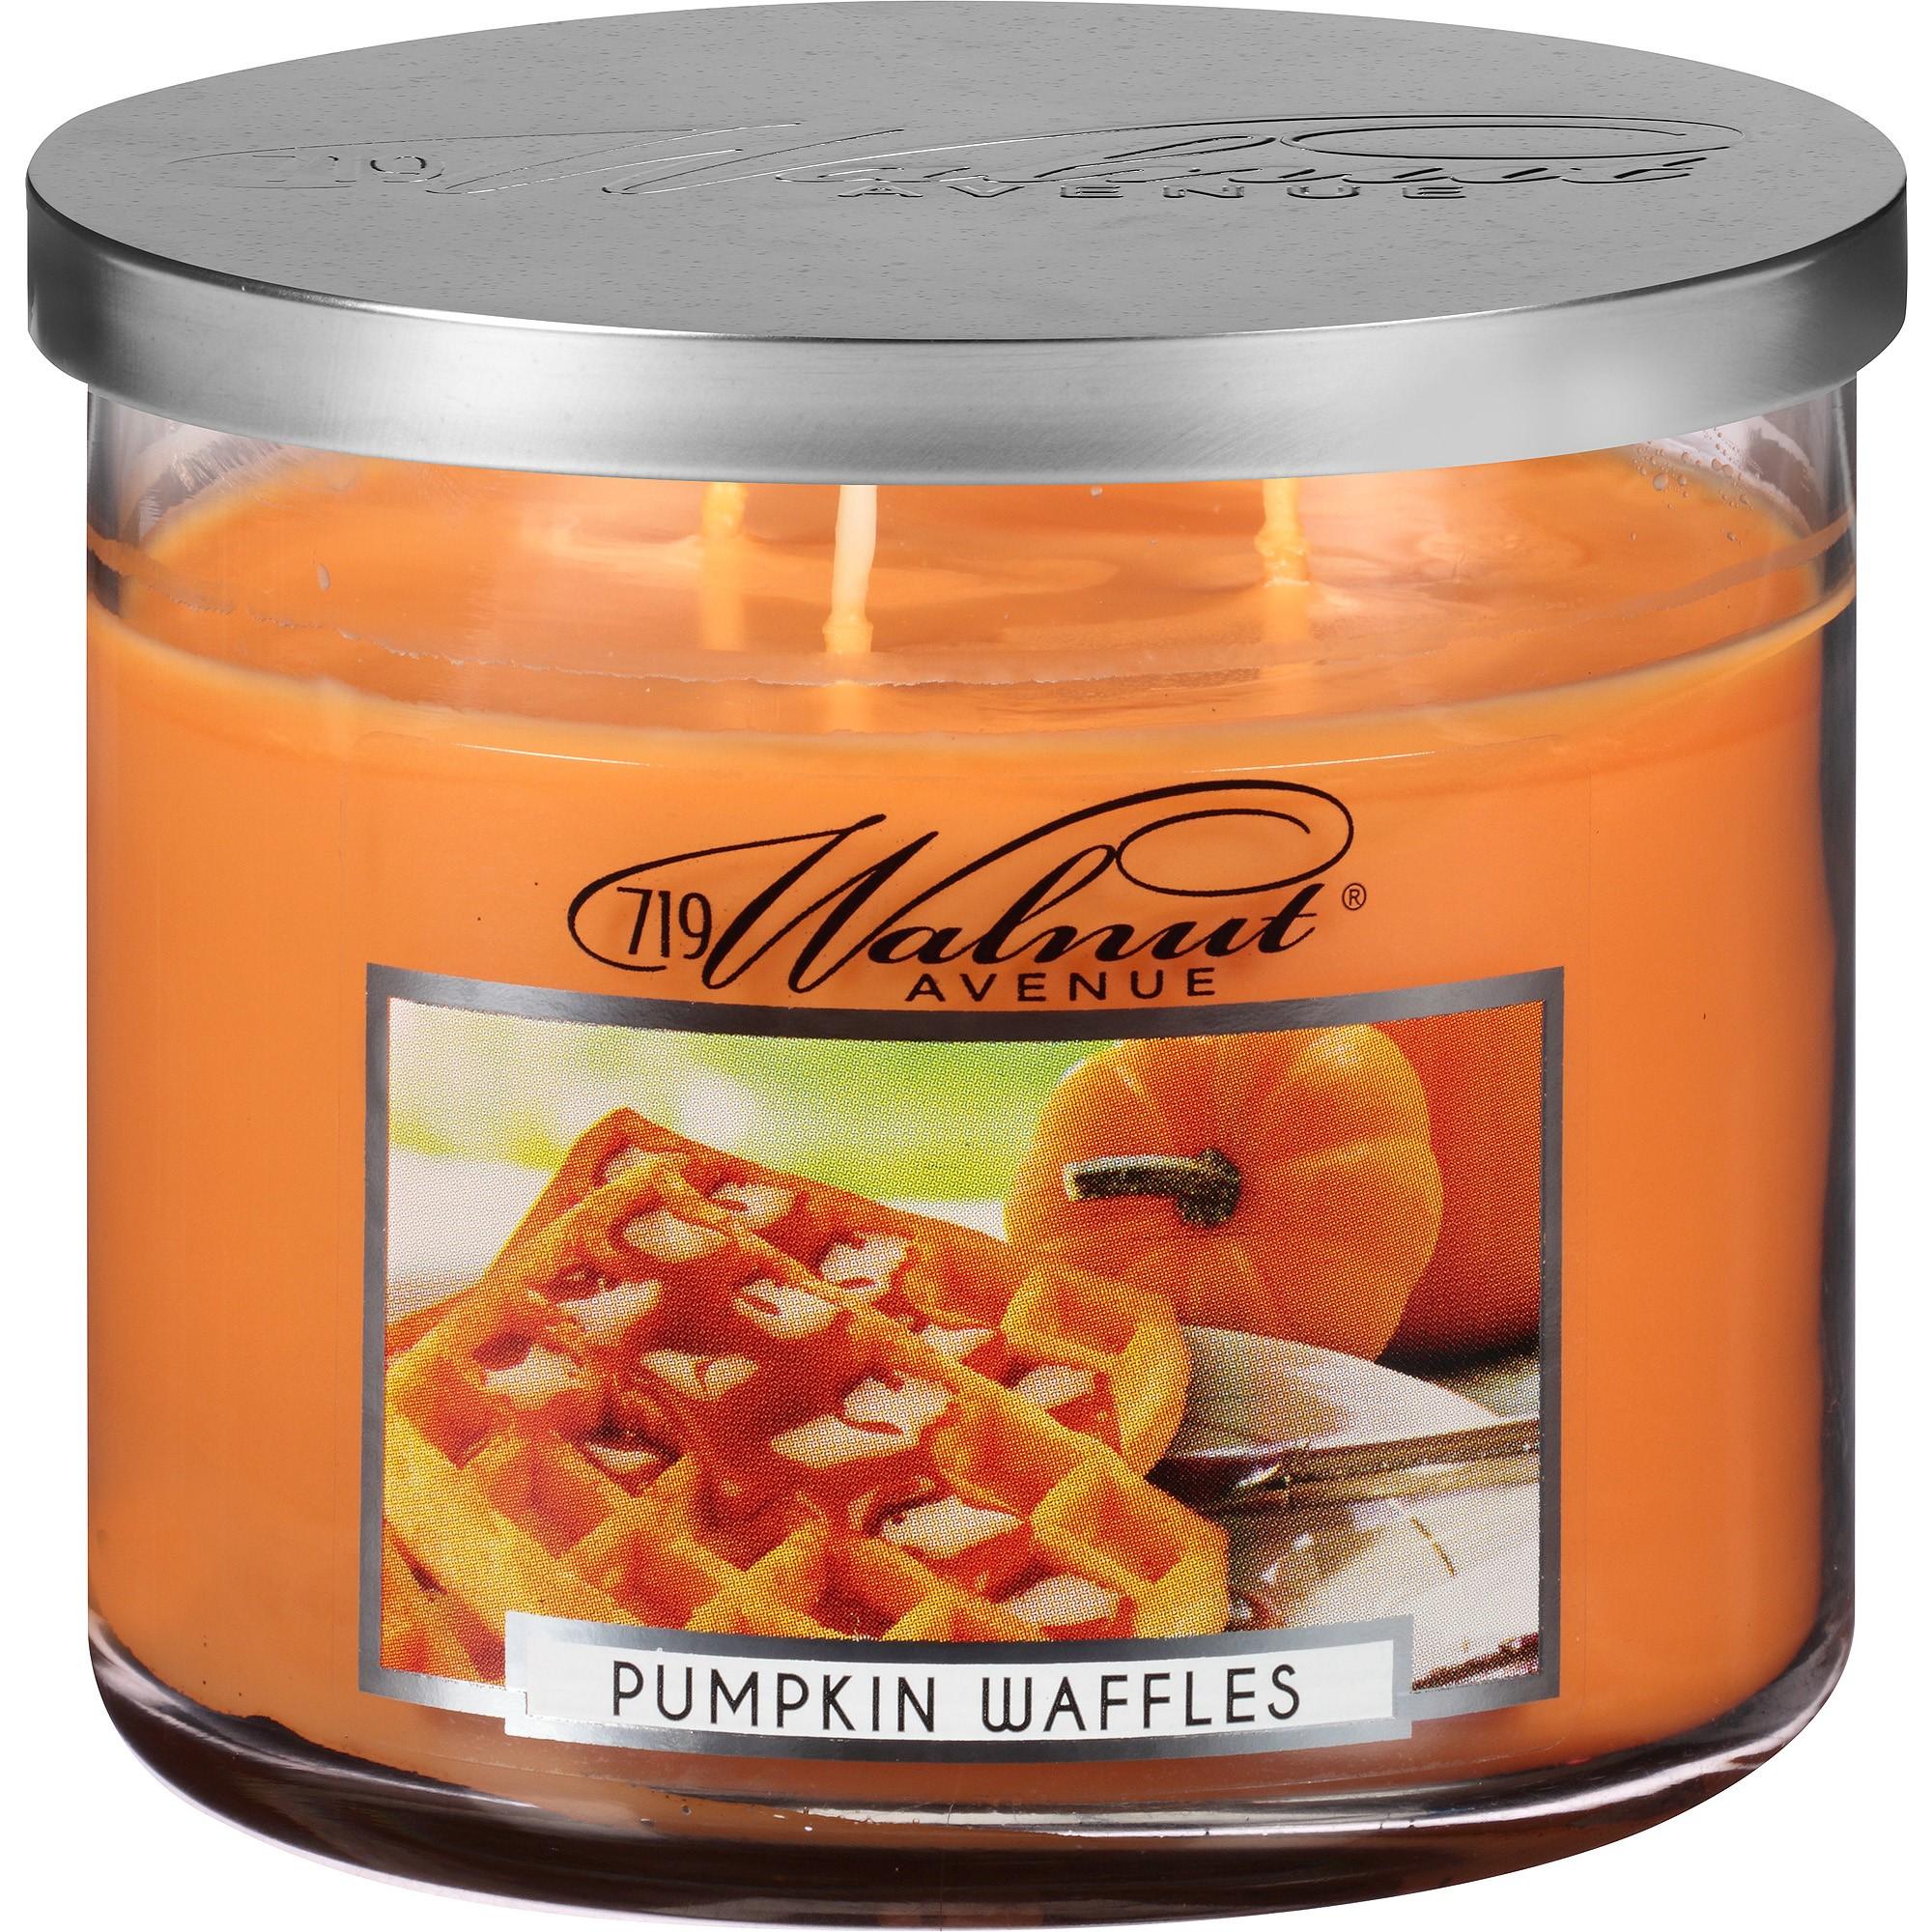 Image of 719 Walnut Avenue Pumpkin Waffles Scented Candle, 14 Oz